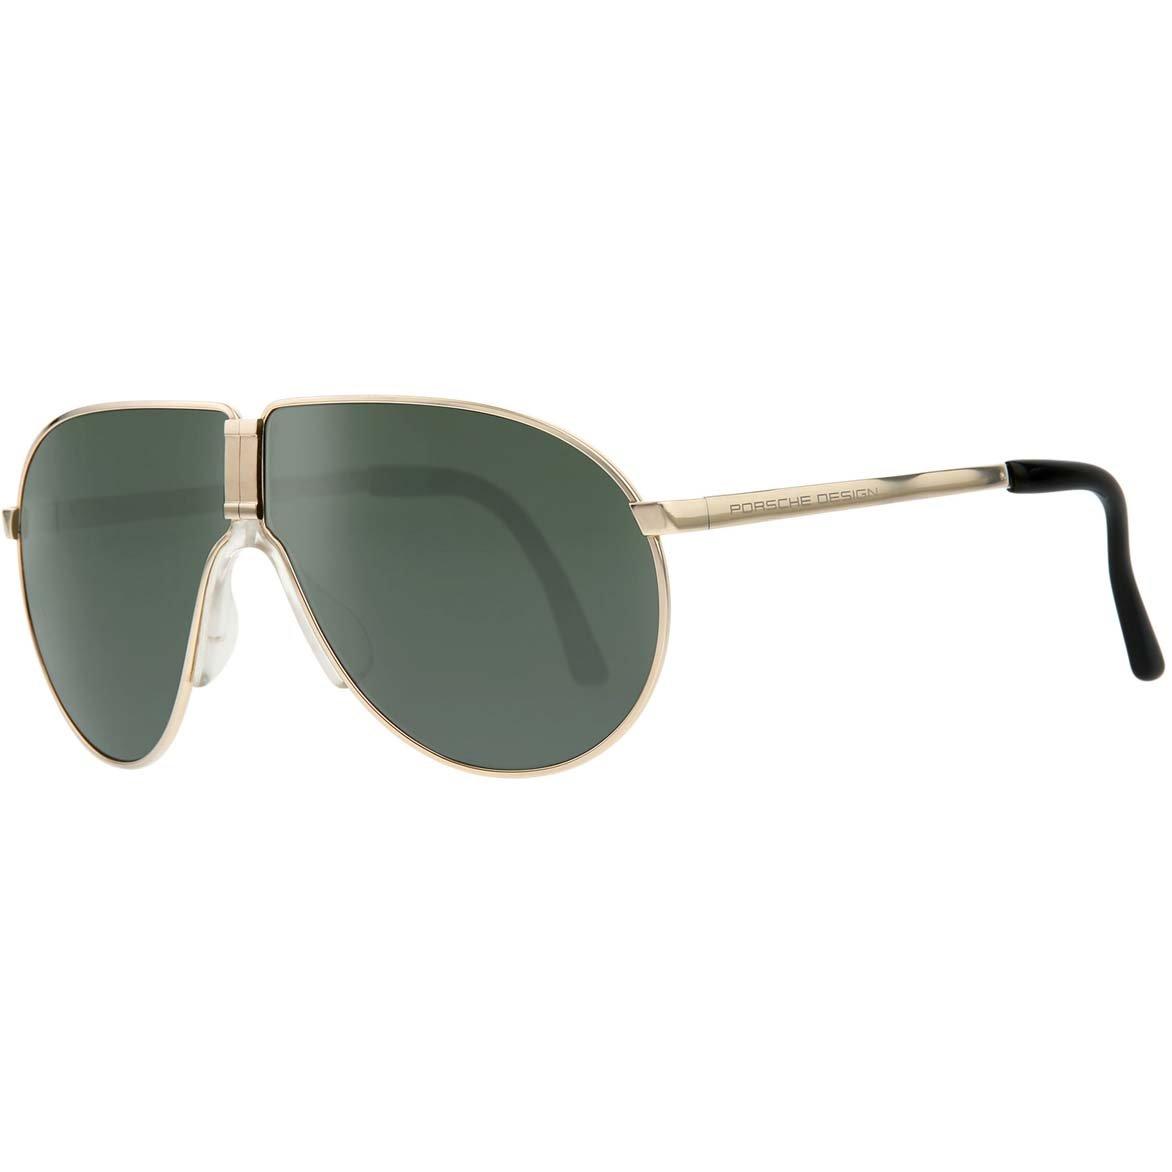 Porsche Design P8480-A - Gafas de sol para hombre: Amazon.es ...